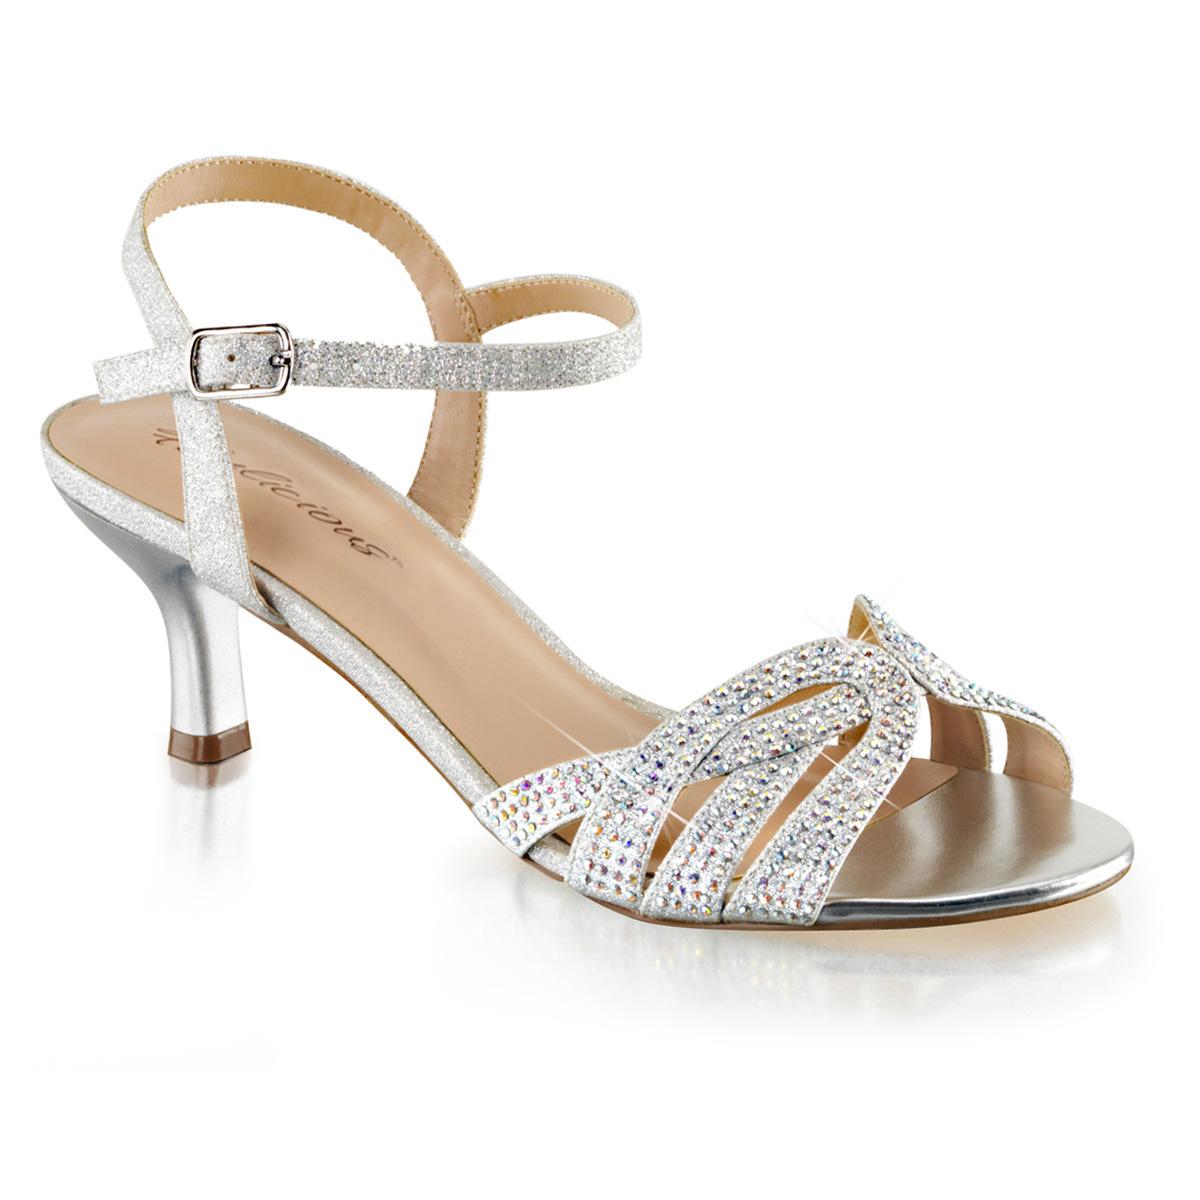 2 1//2/'/' Kitten Heel Sandal by PleaserUSA AUDREY-03